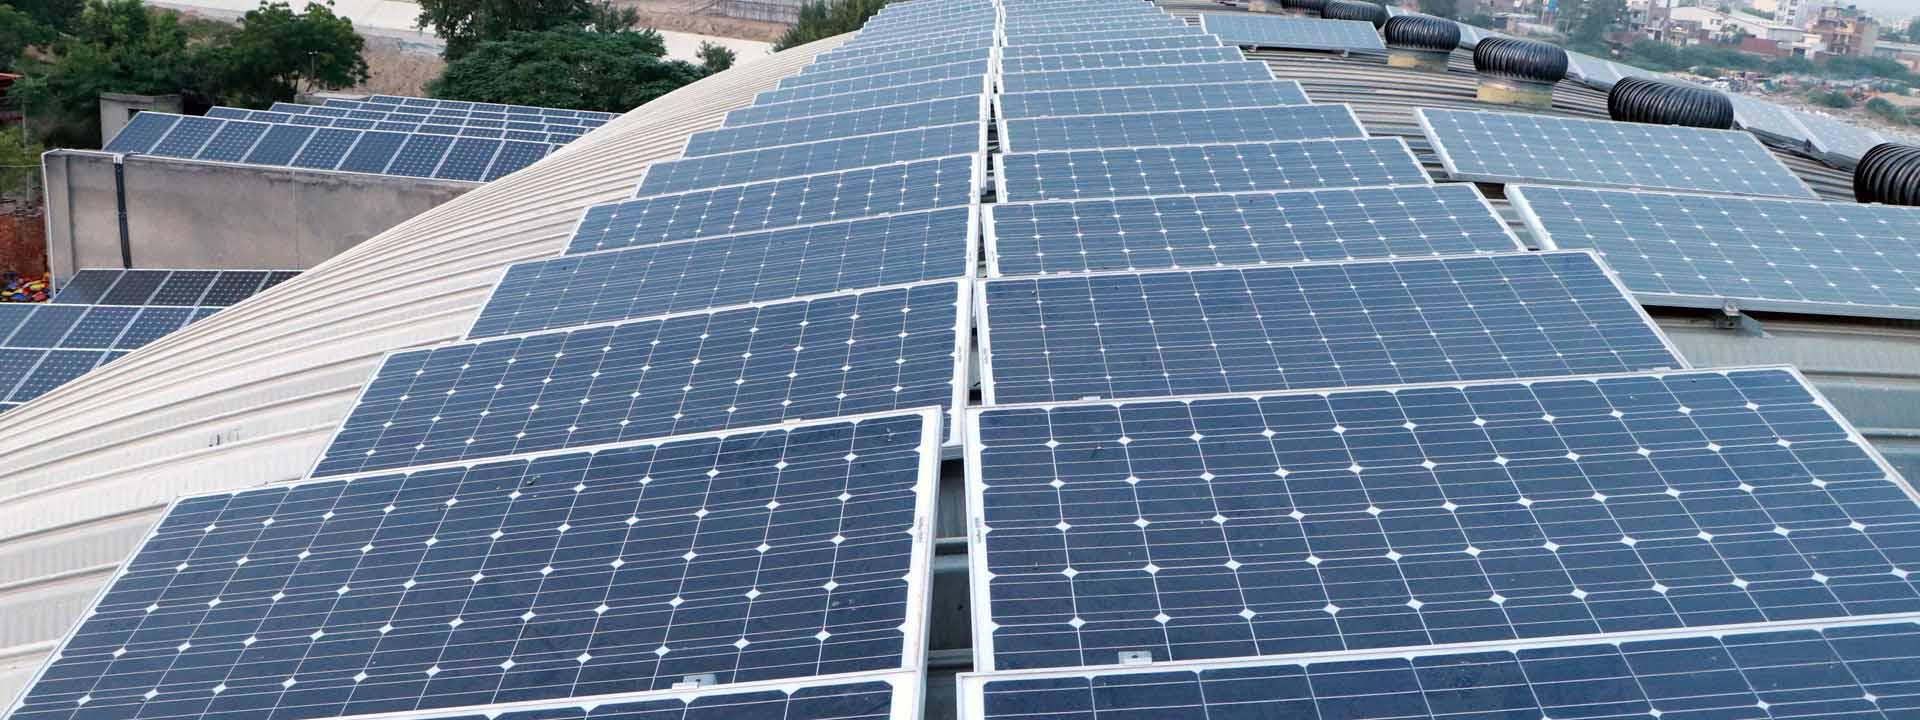 High Efficiency Solar Panels   Monocrystalline Silicon Solar Cells   Mono Si Panels Manufacturing   SolarMaxx